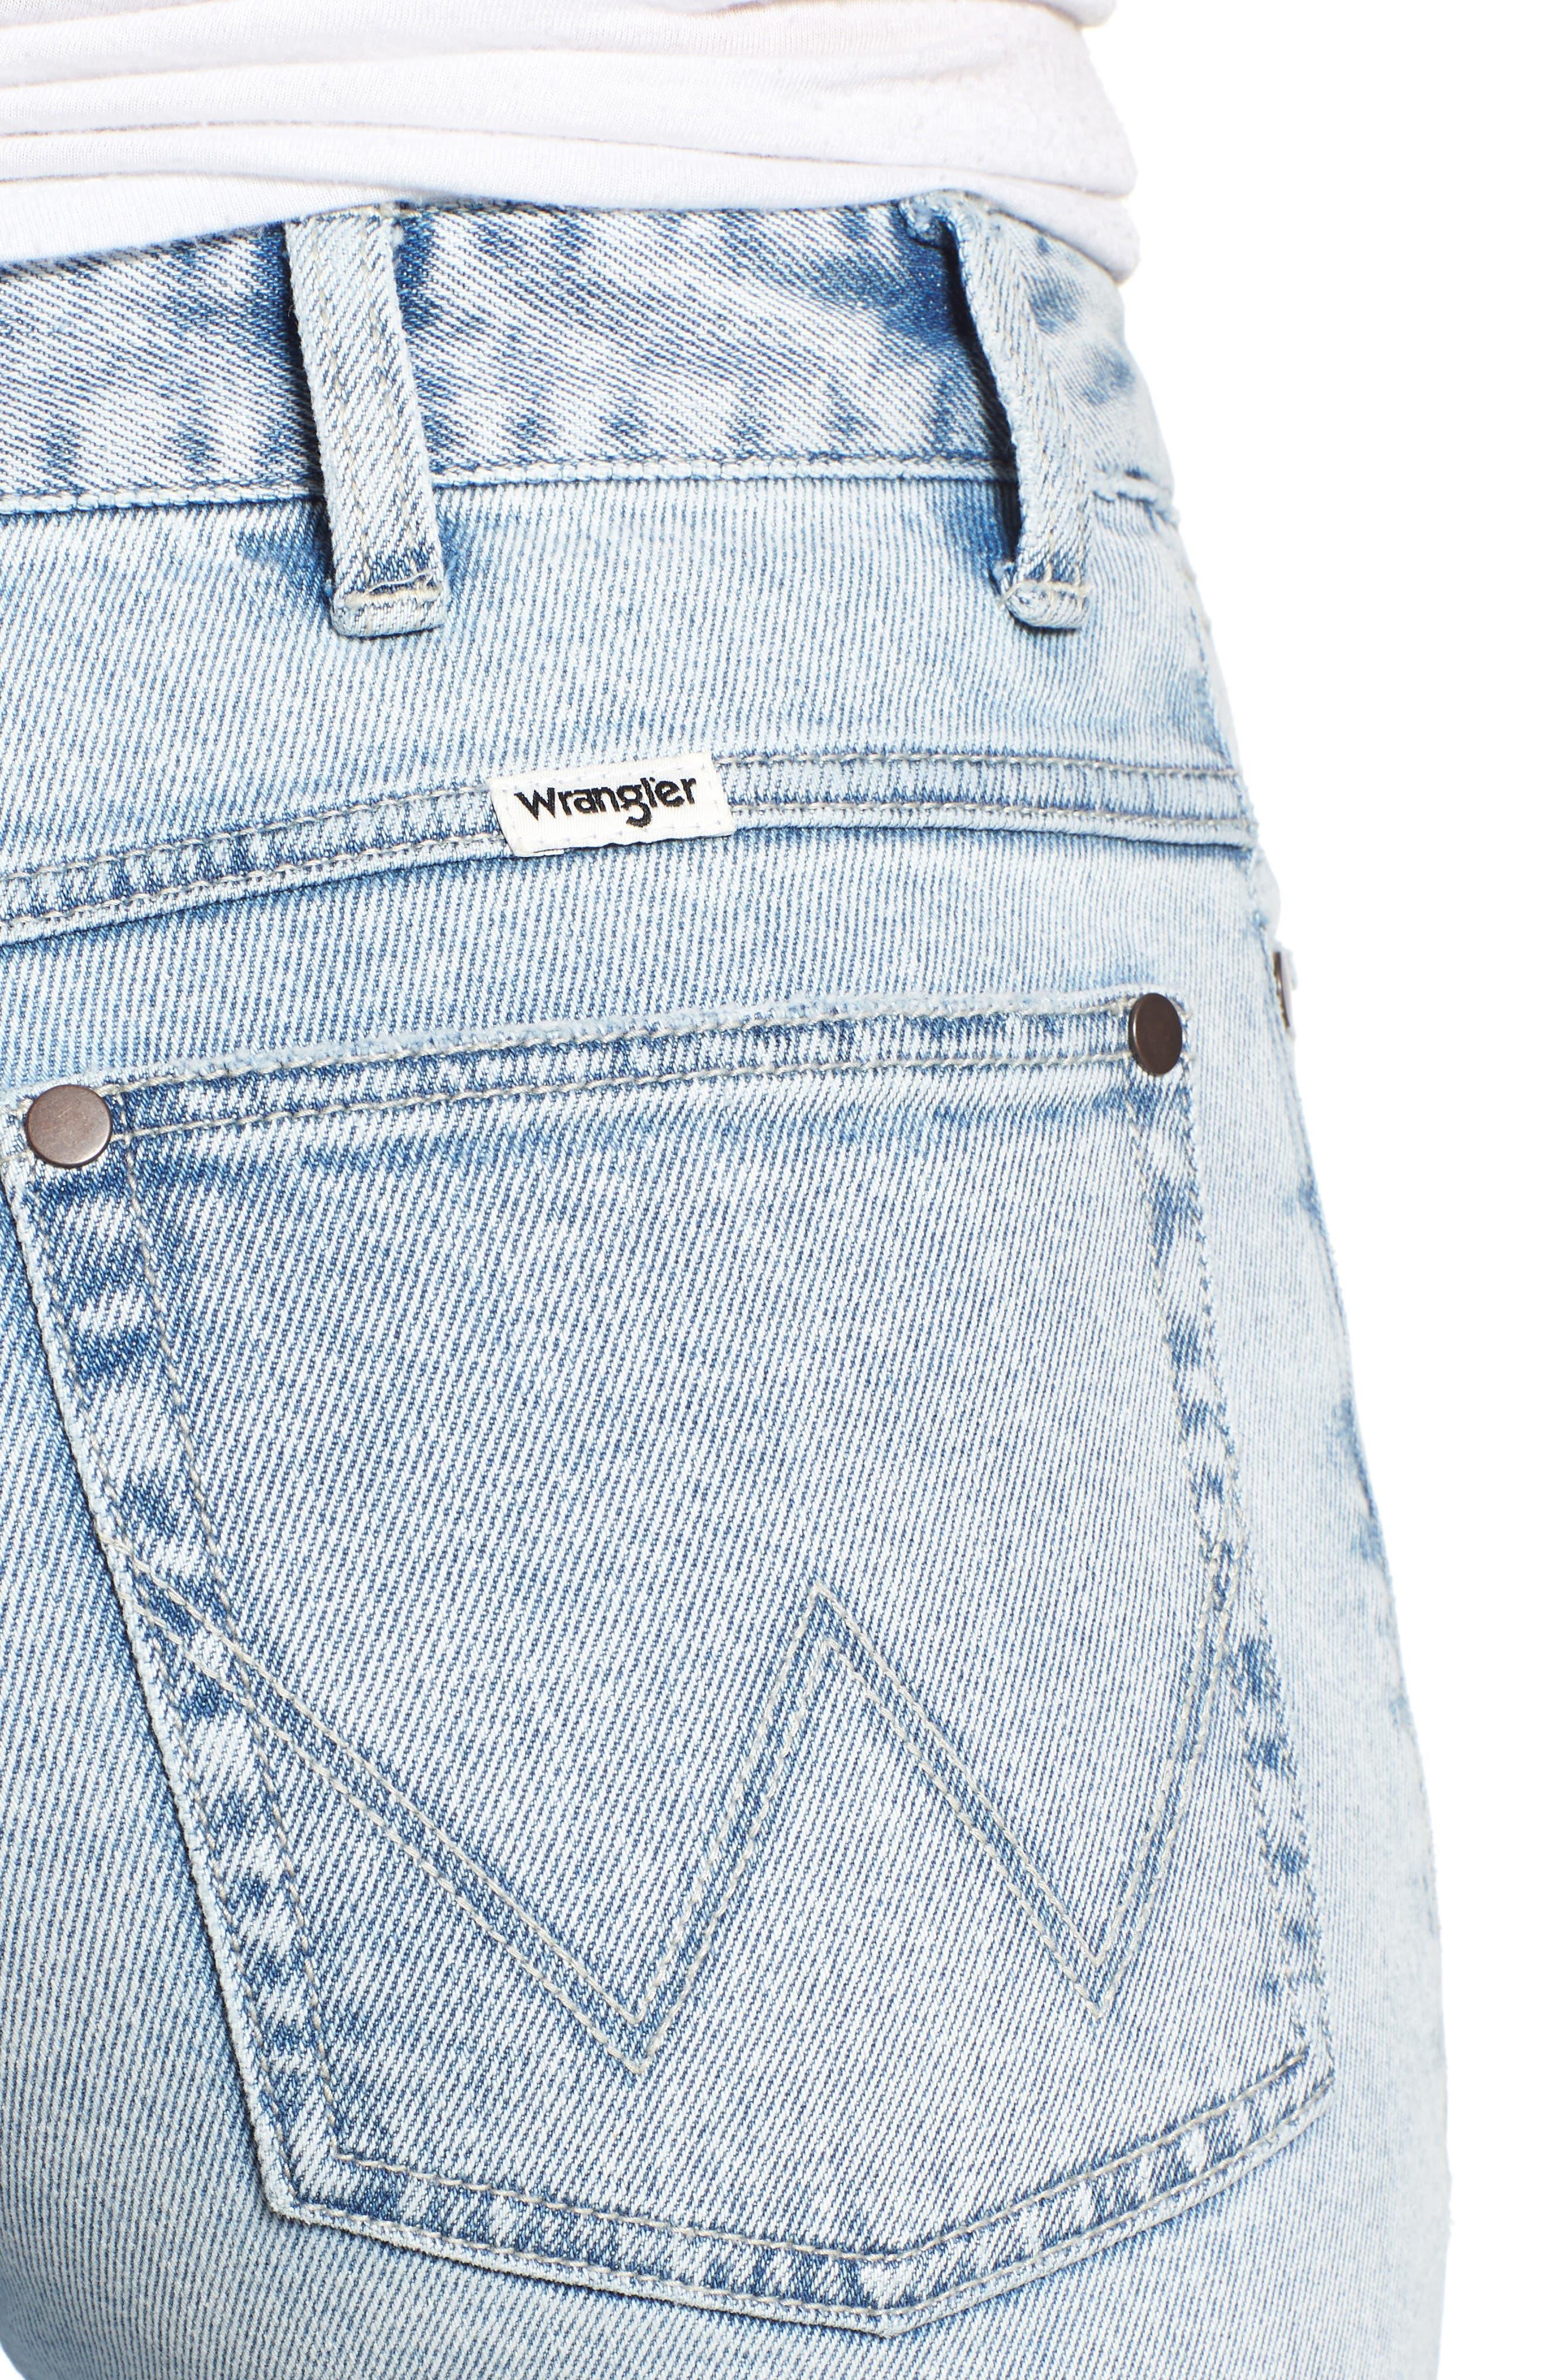 Acid Wash High Waist Crop Jeans,                             Alternate thumbnail 4, color,                             454